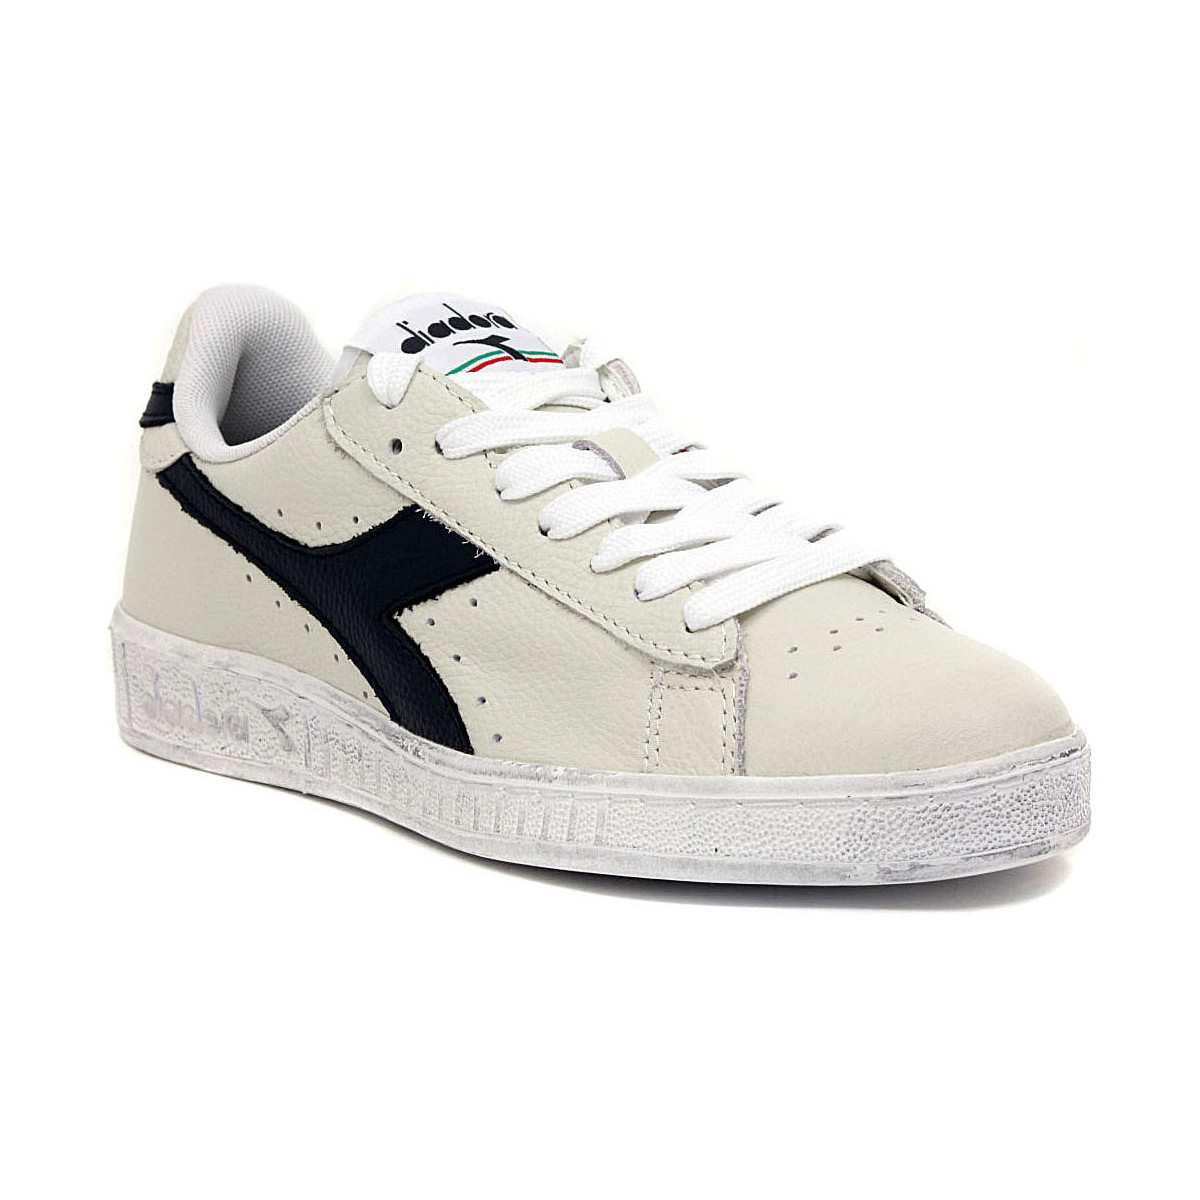 diadora game high scarpe donna bianche pelle 158518 scarpe diadora bianche 1f8d8f2b069